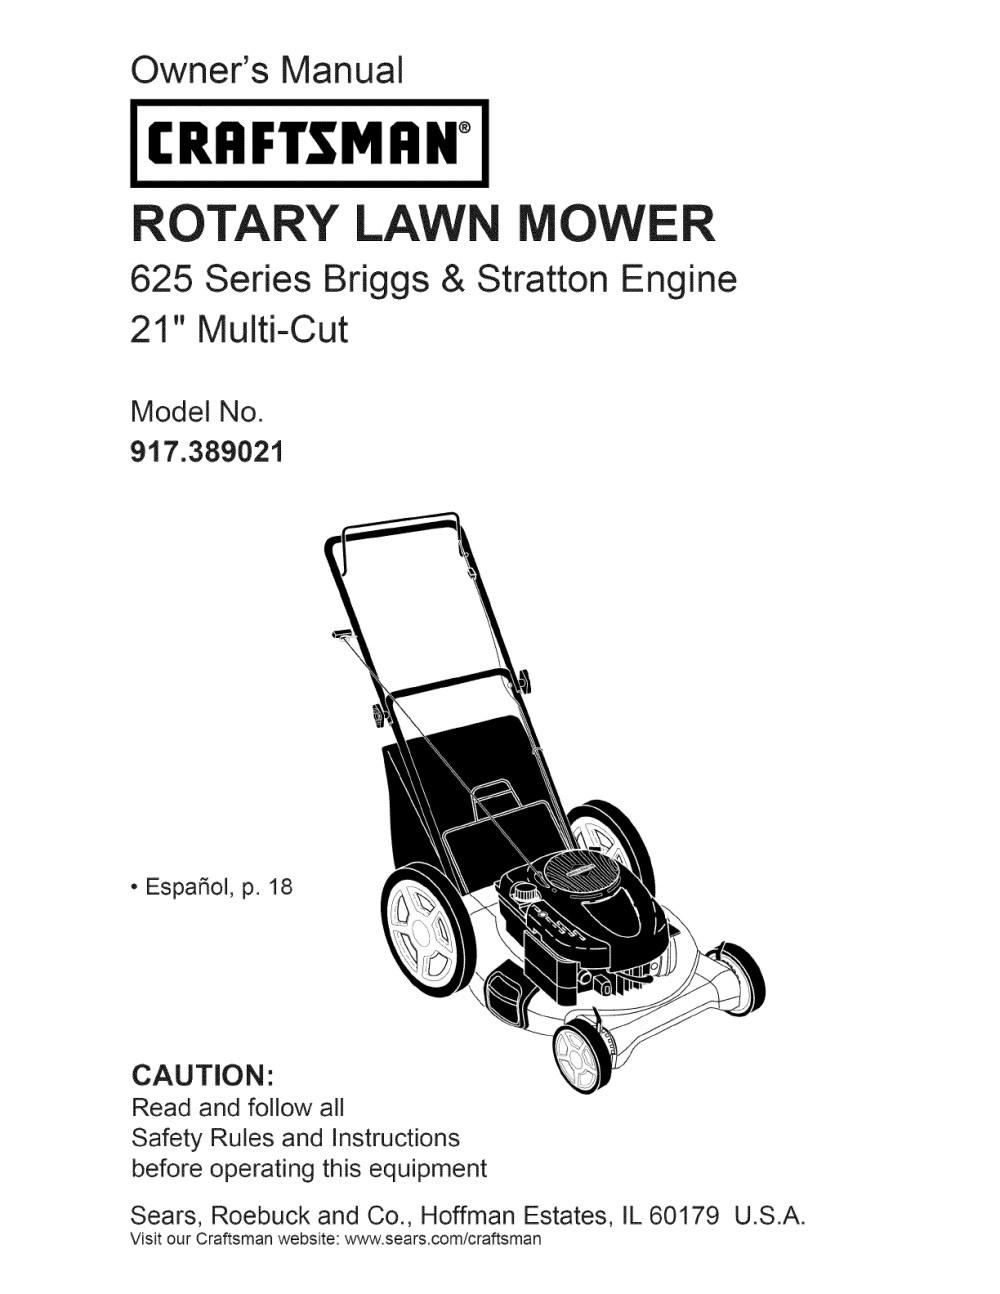 medium resolution of craftsman lawn mower model 917 wiring diagram husqvarna tractor parts diagram unique craftsman lawn mower